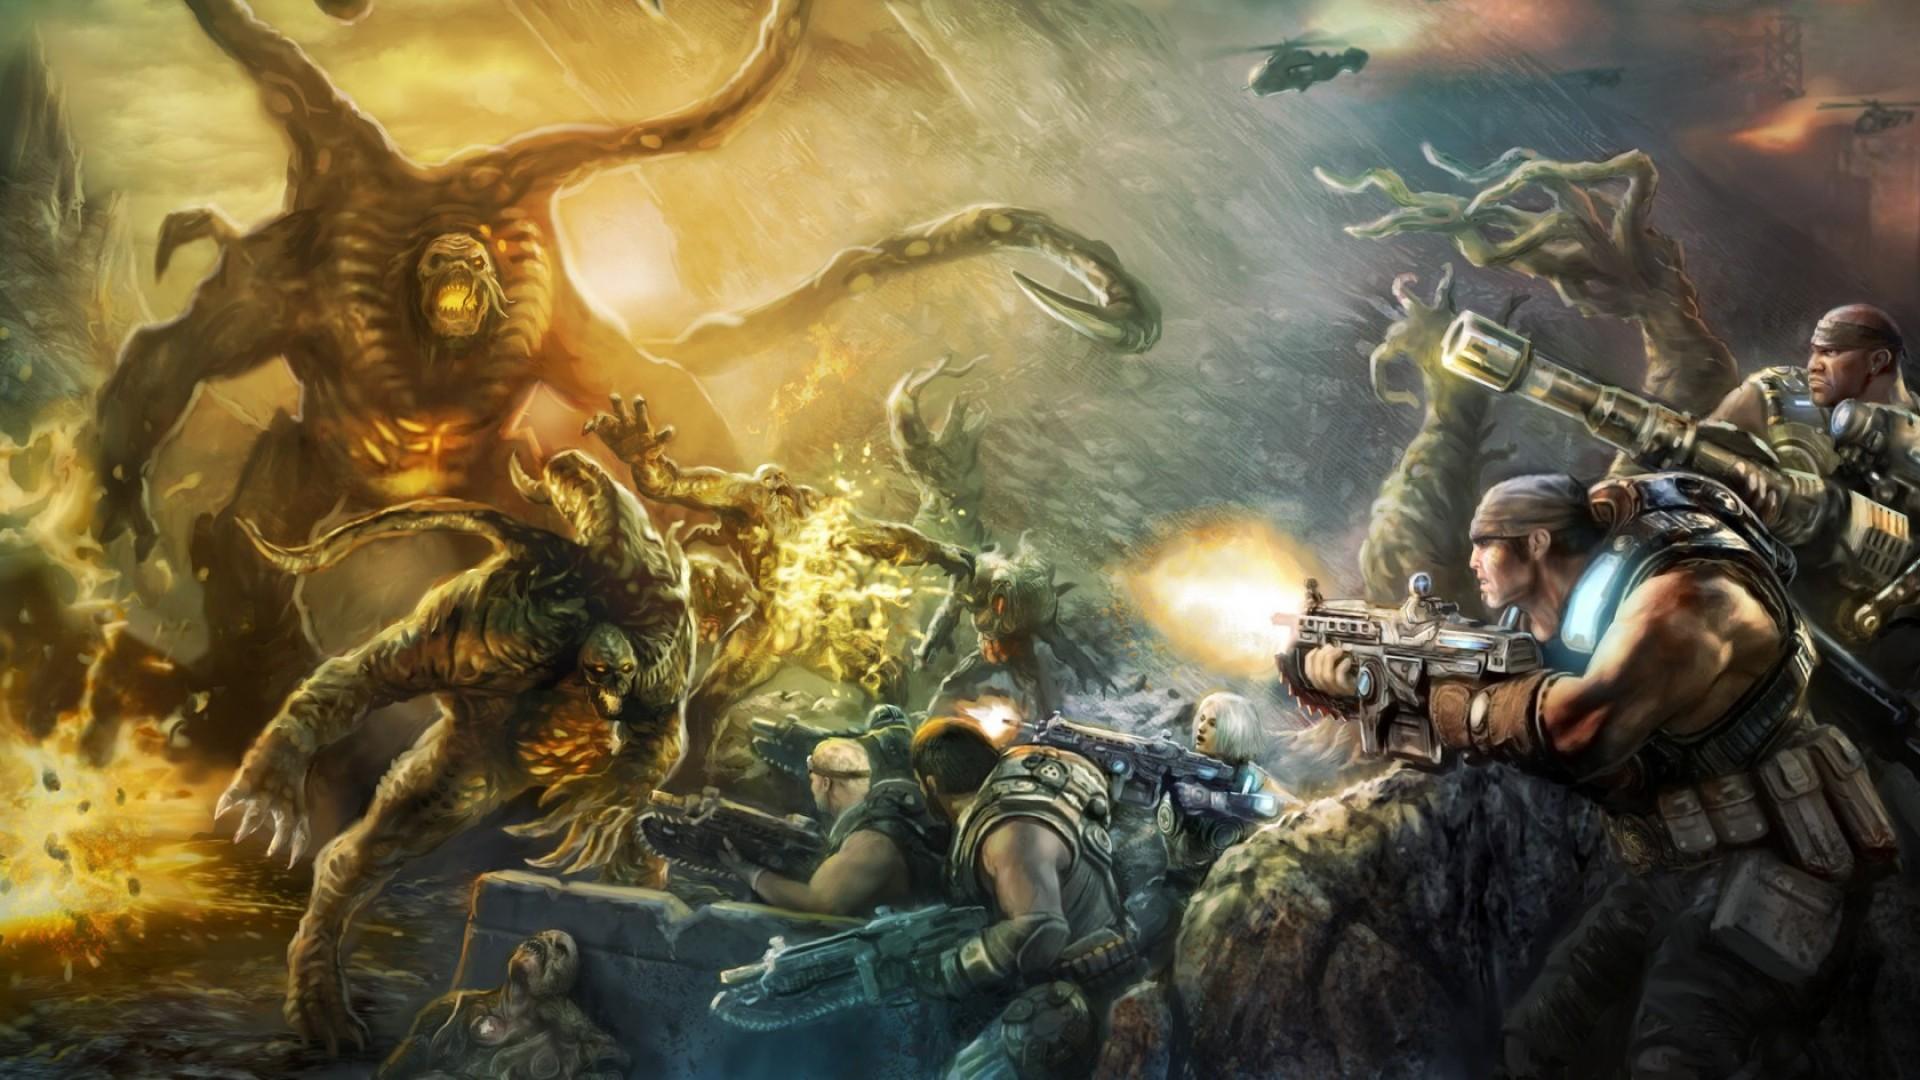 Gaming Wallpapers: Epic Gaming Wallpapers ·①